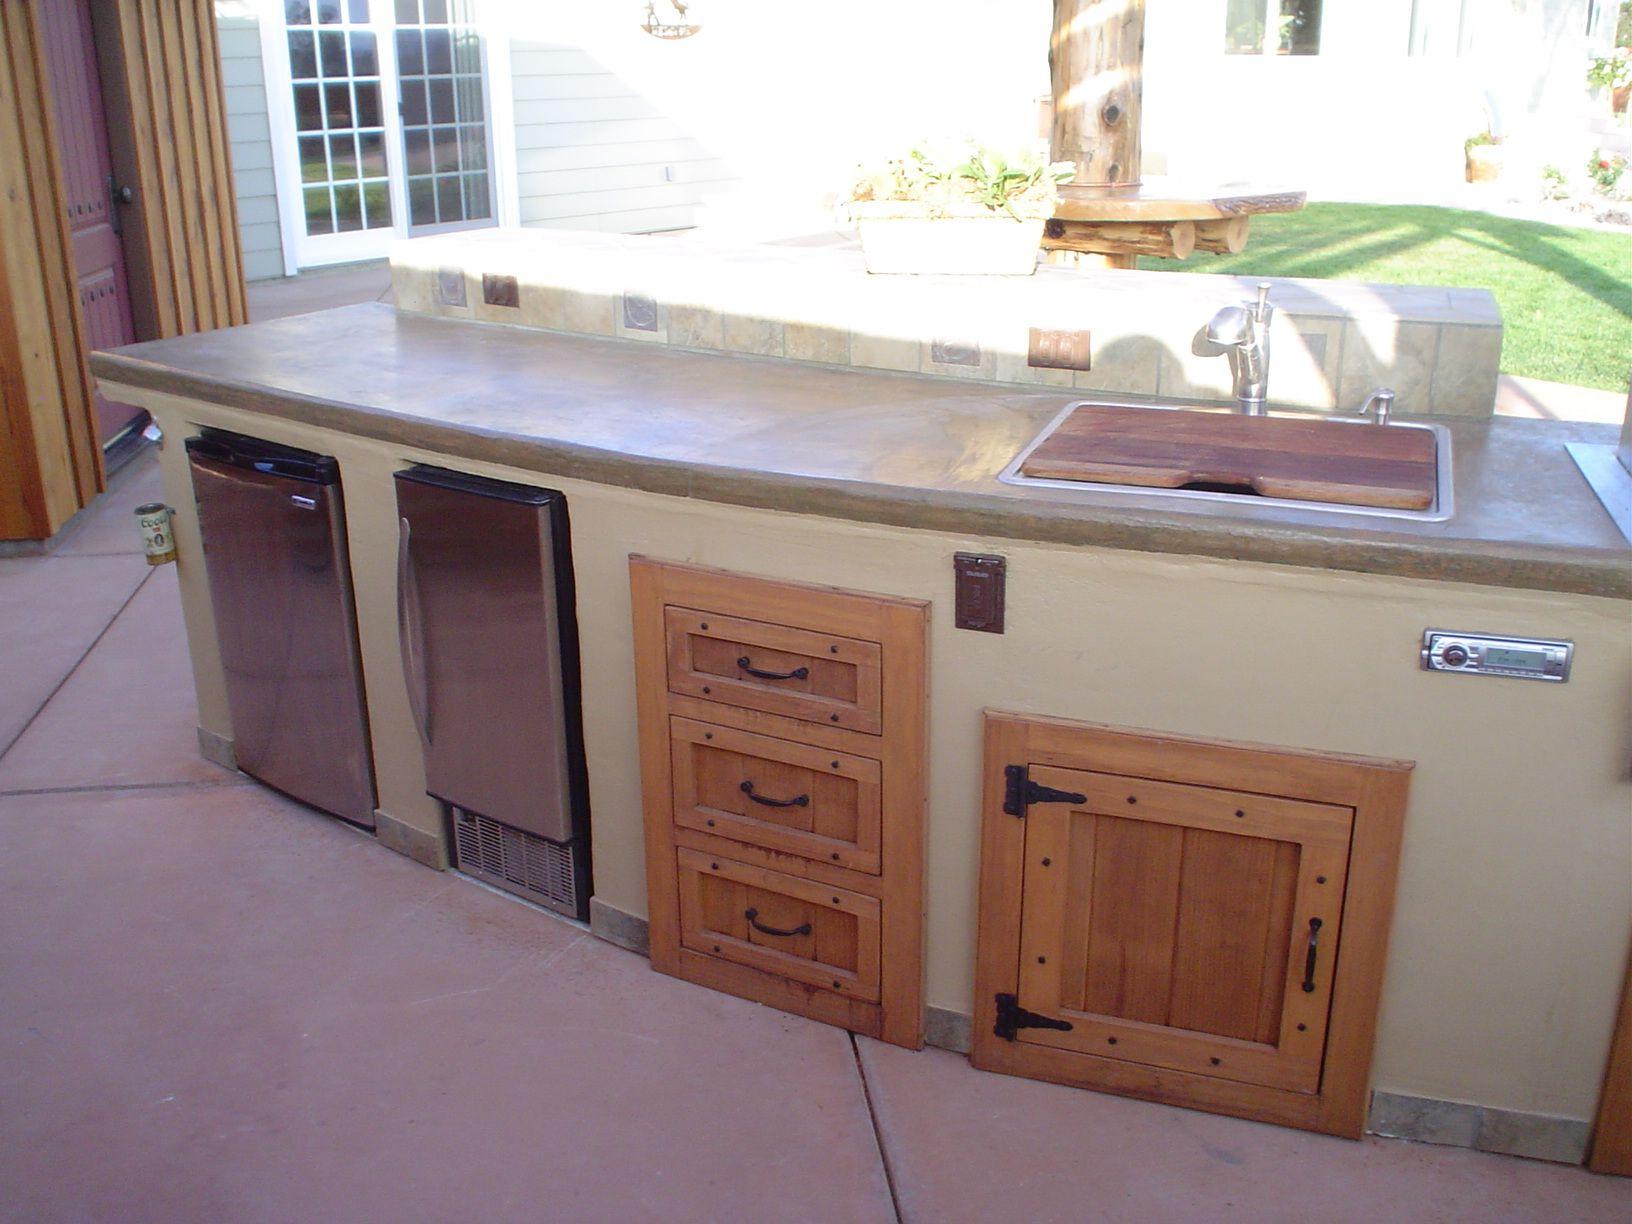 2 Tone Island With Wood Doors Wood Cabinet Doors Modular Outdoor Kitchens Outdoor Kitchen Cabinets